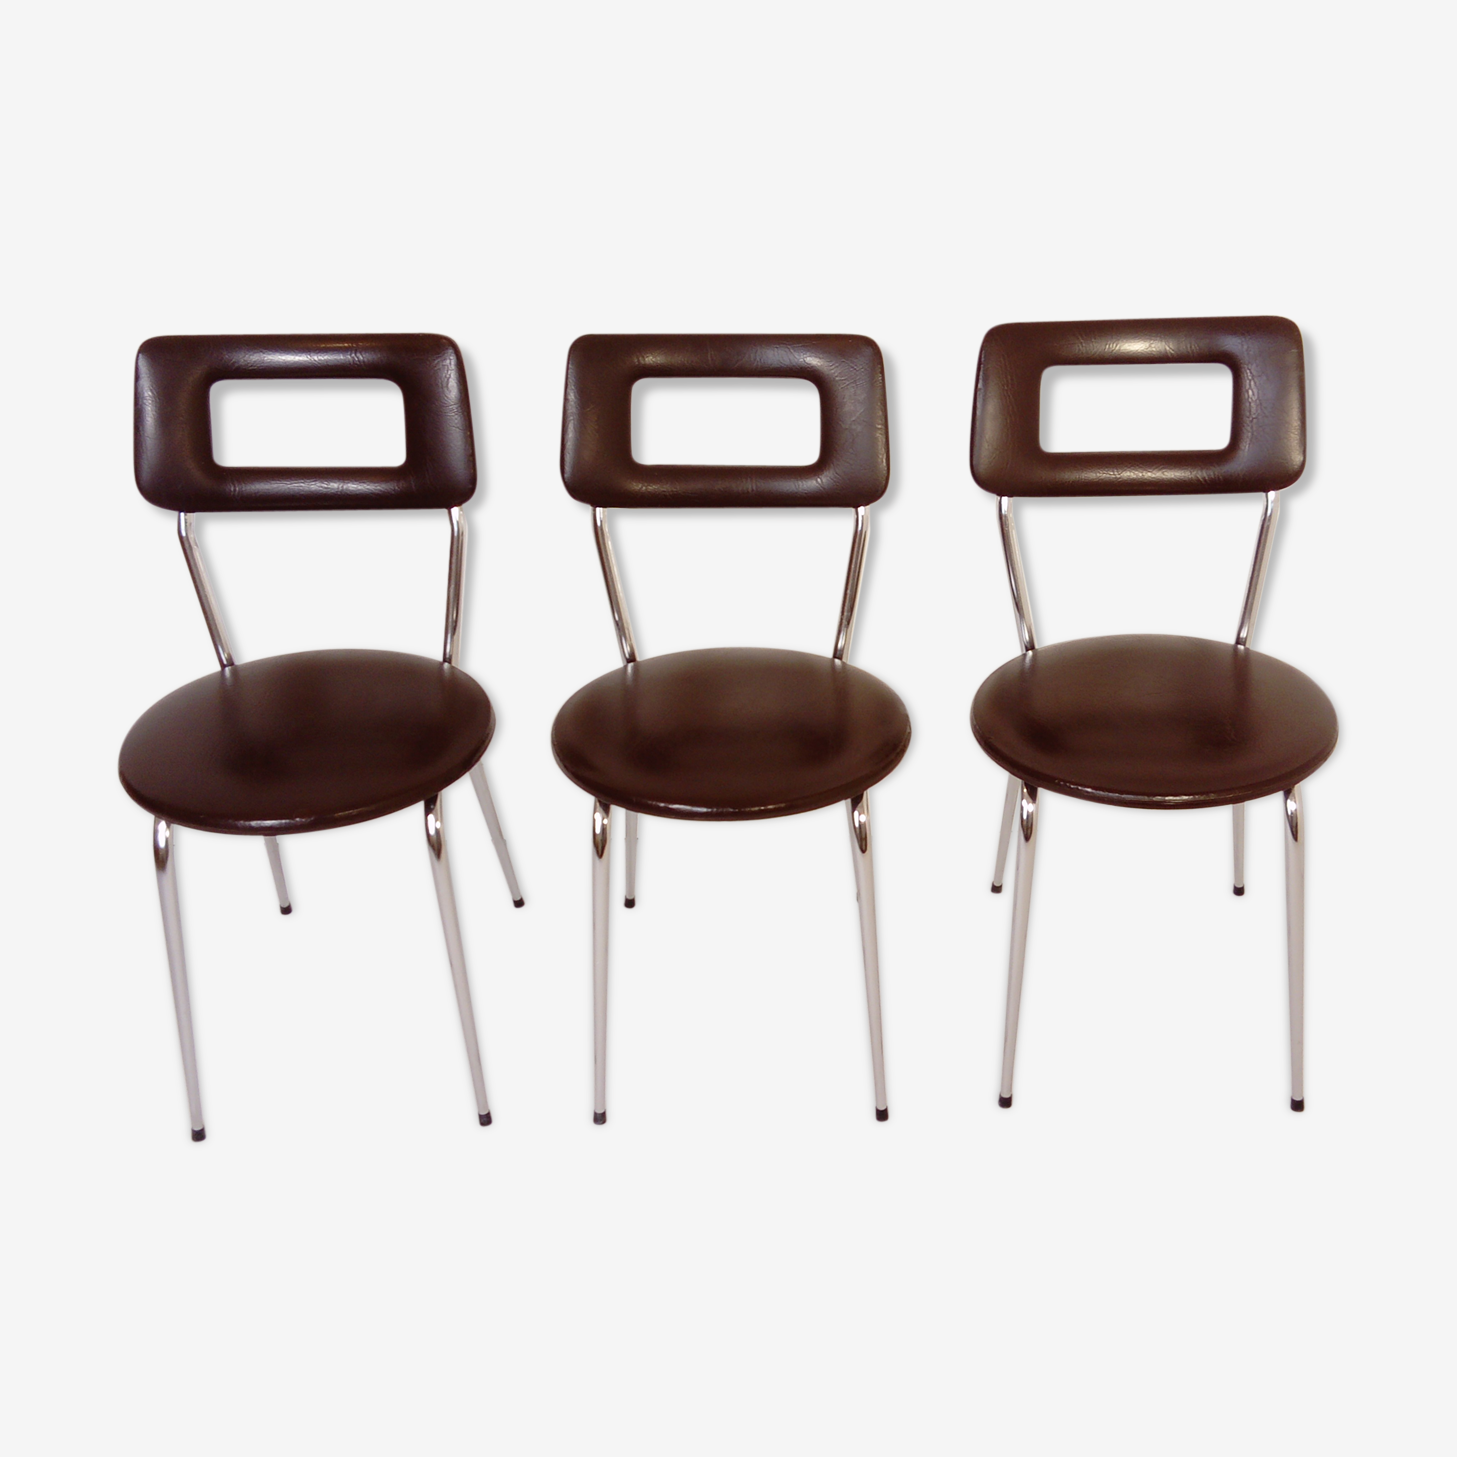 Lot de 3 chaises en skai marron design 1970